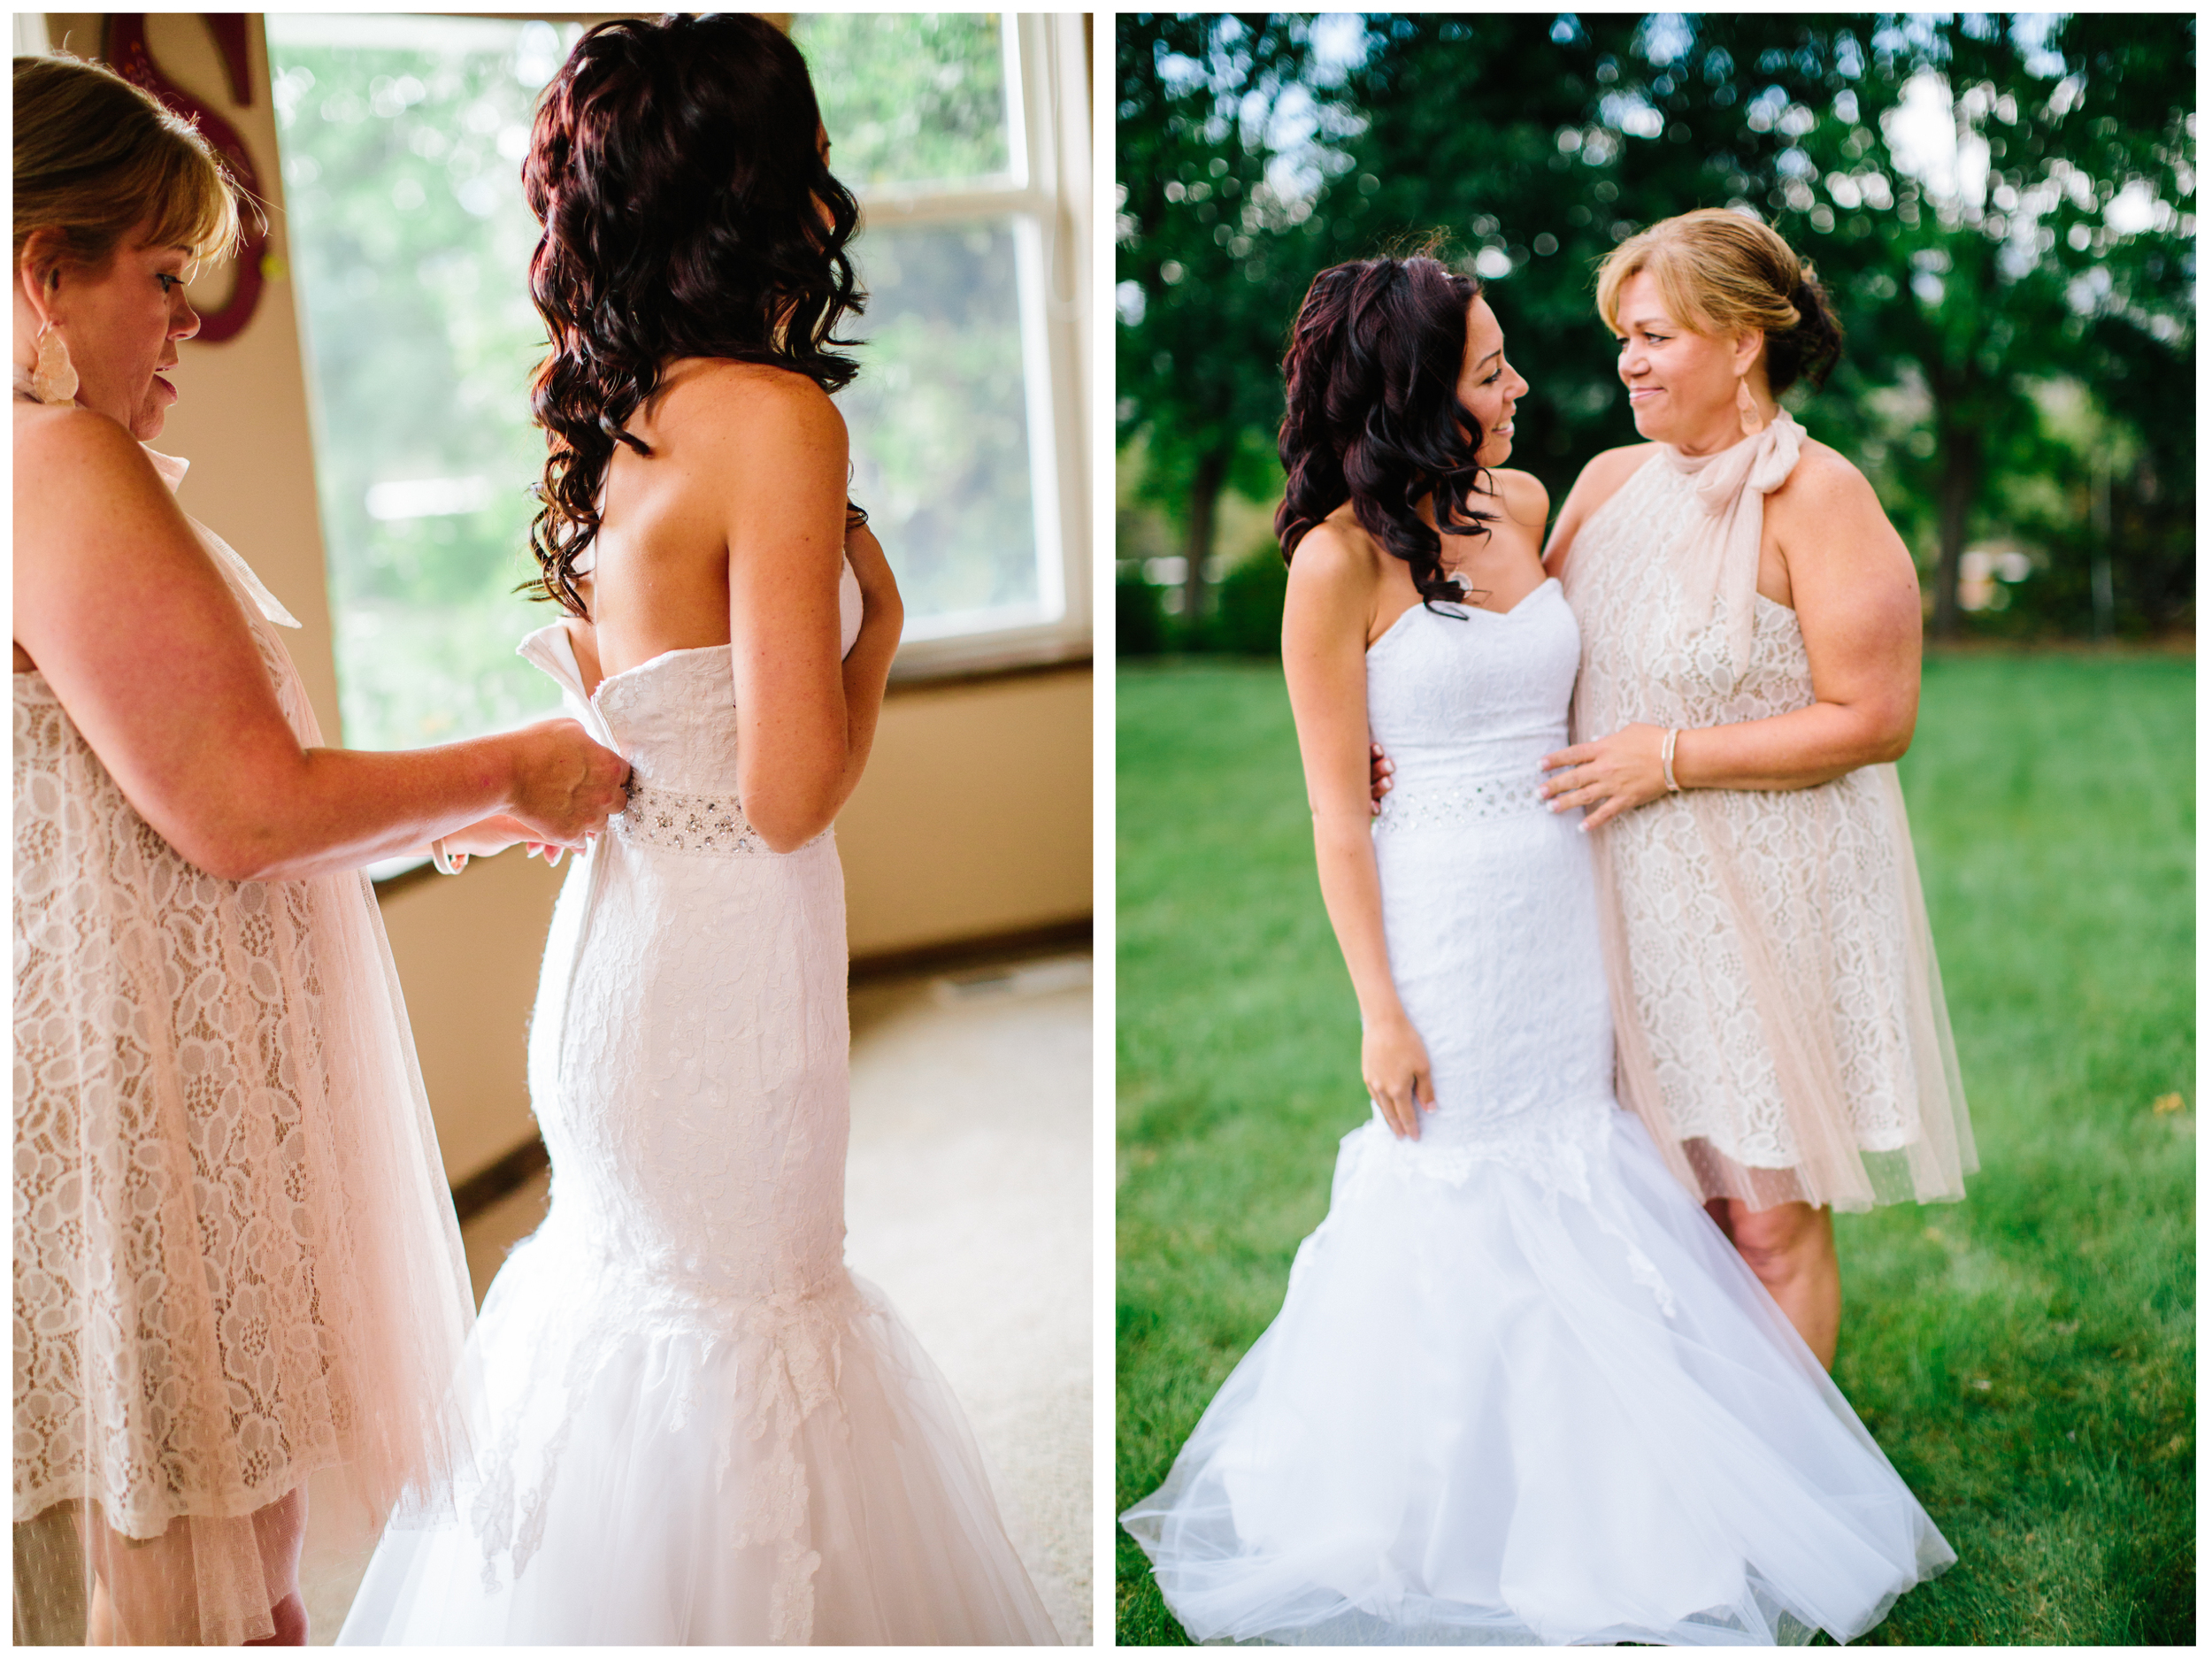 Prescott-Wedding-Photographer-Dip-1.jpg